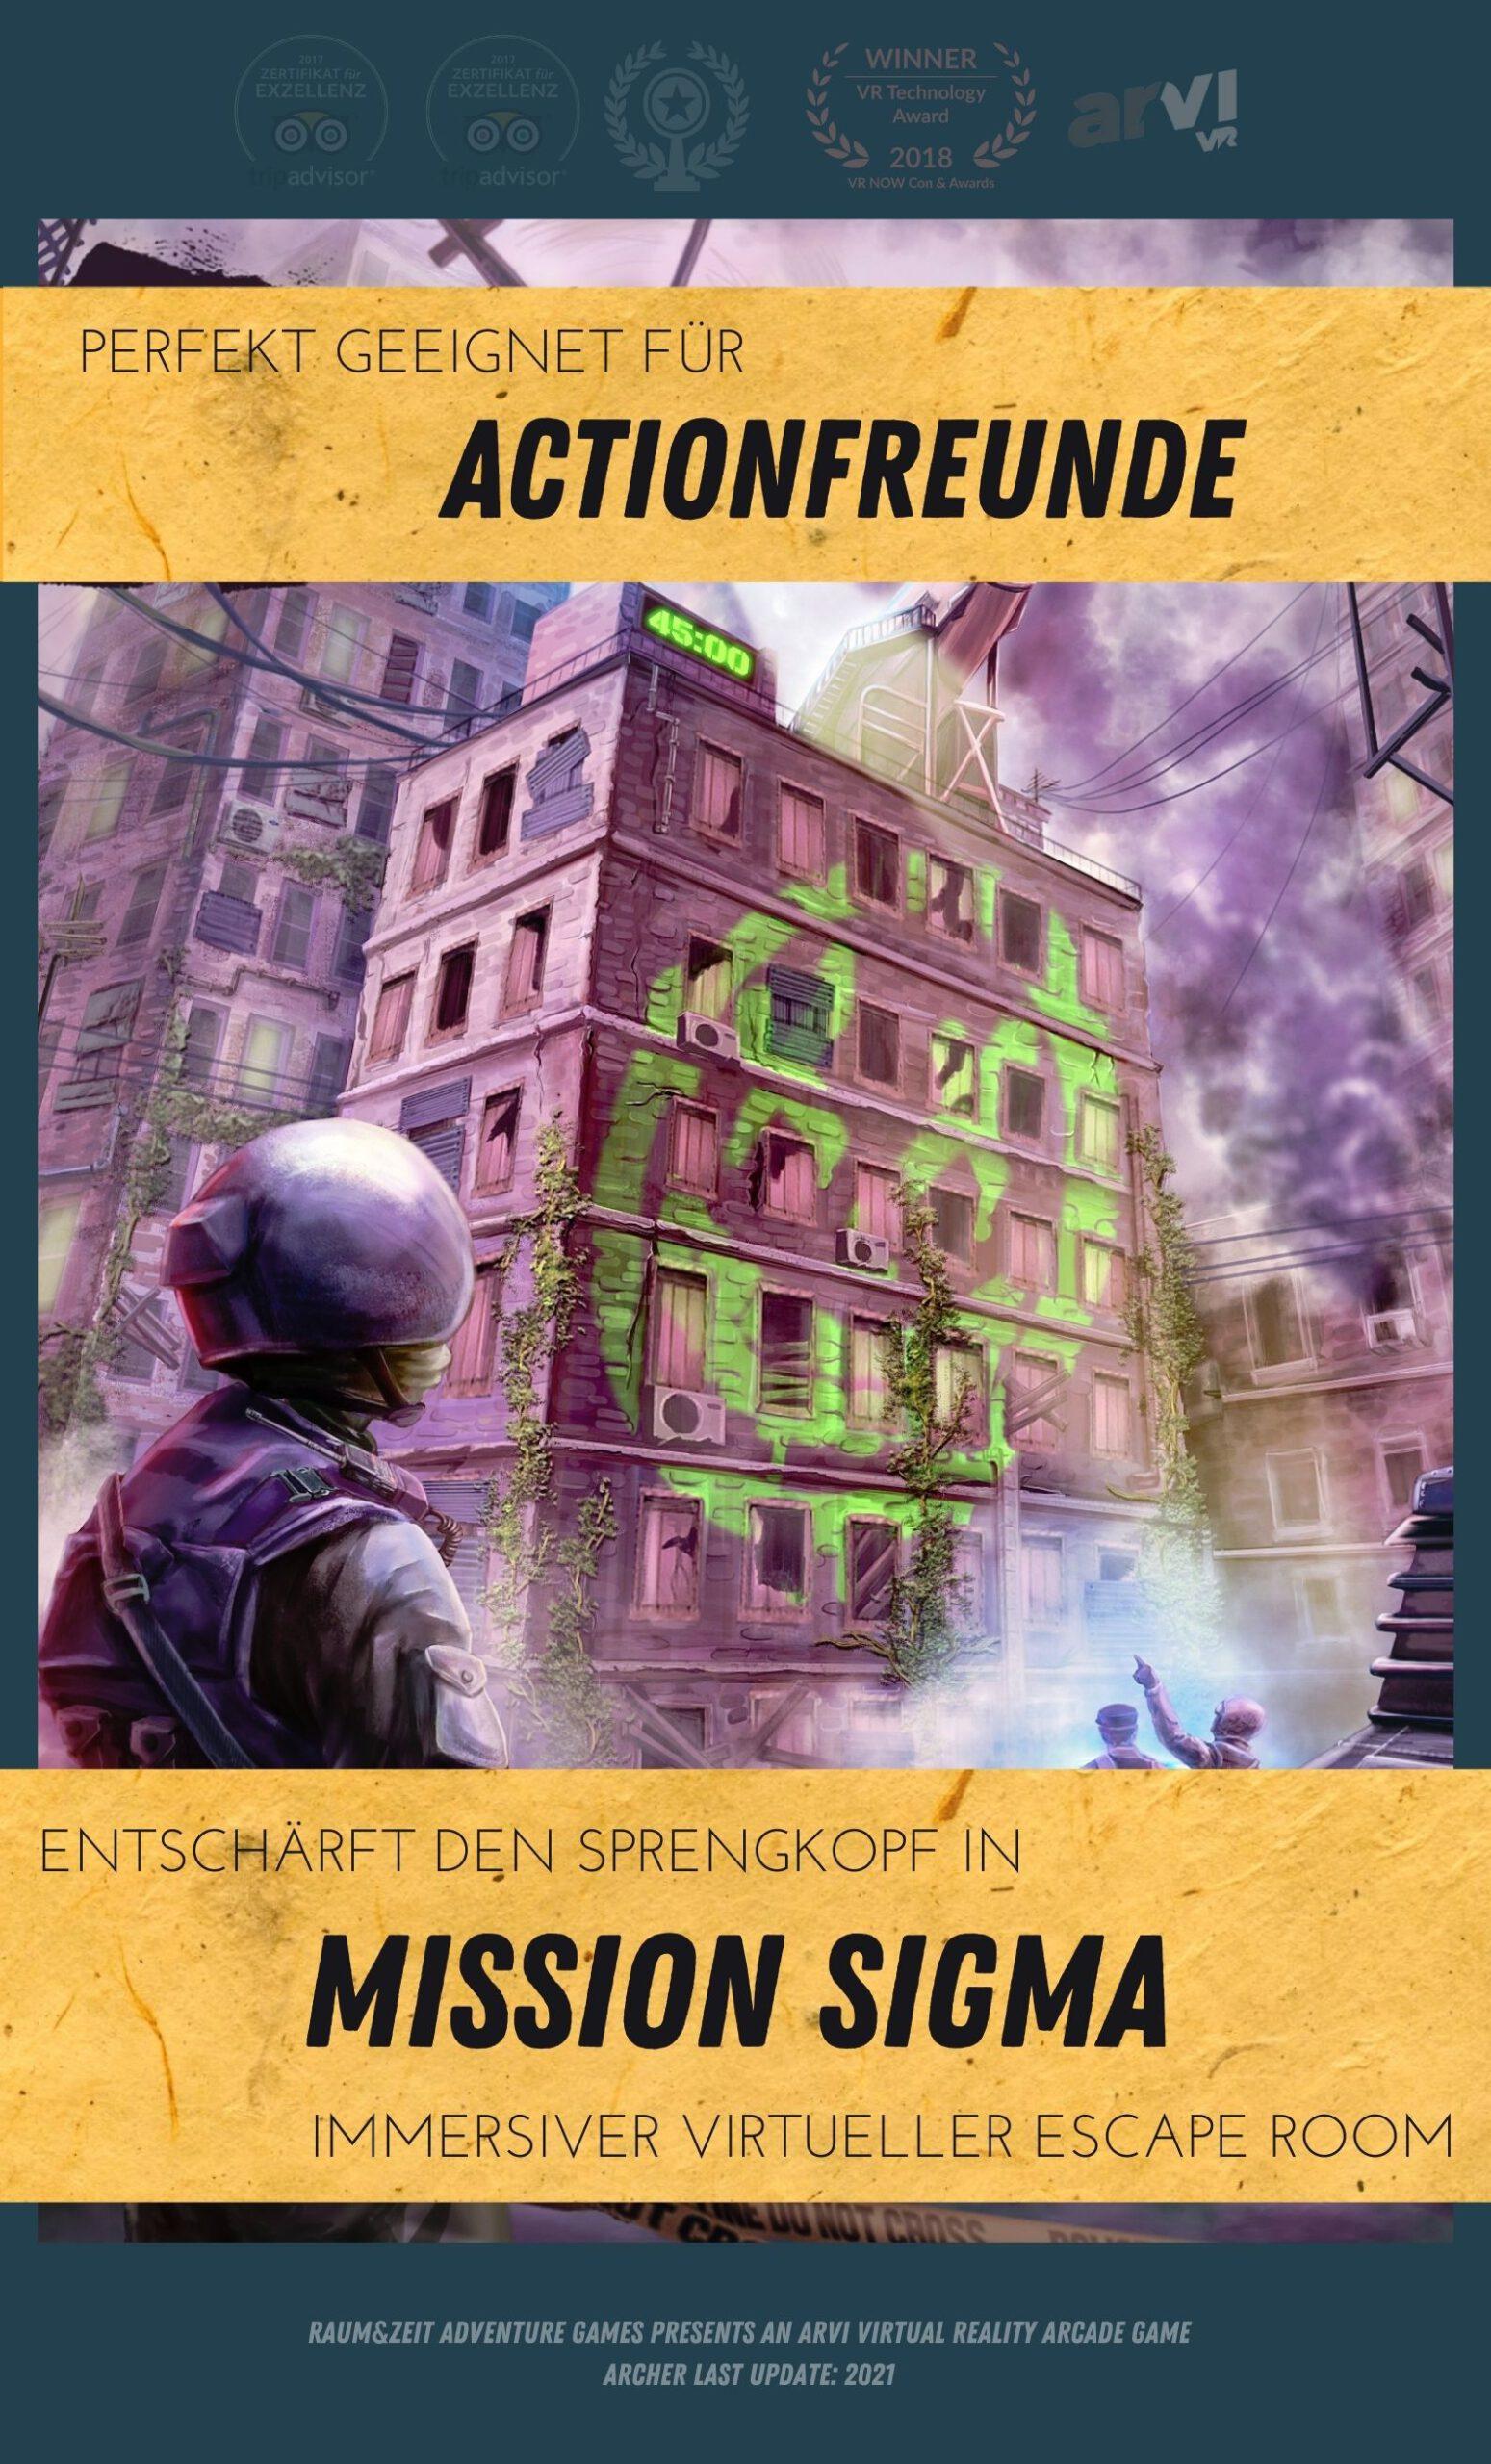 Mission-Sigma-scaled.jpg